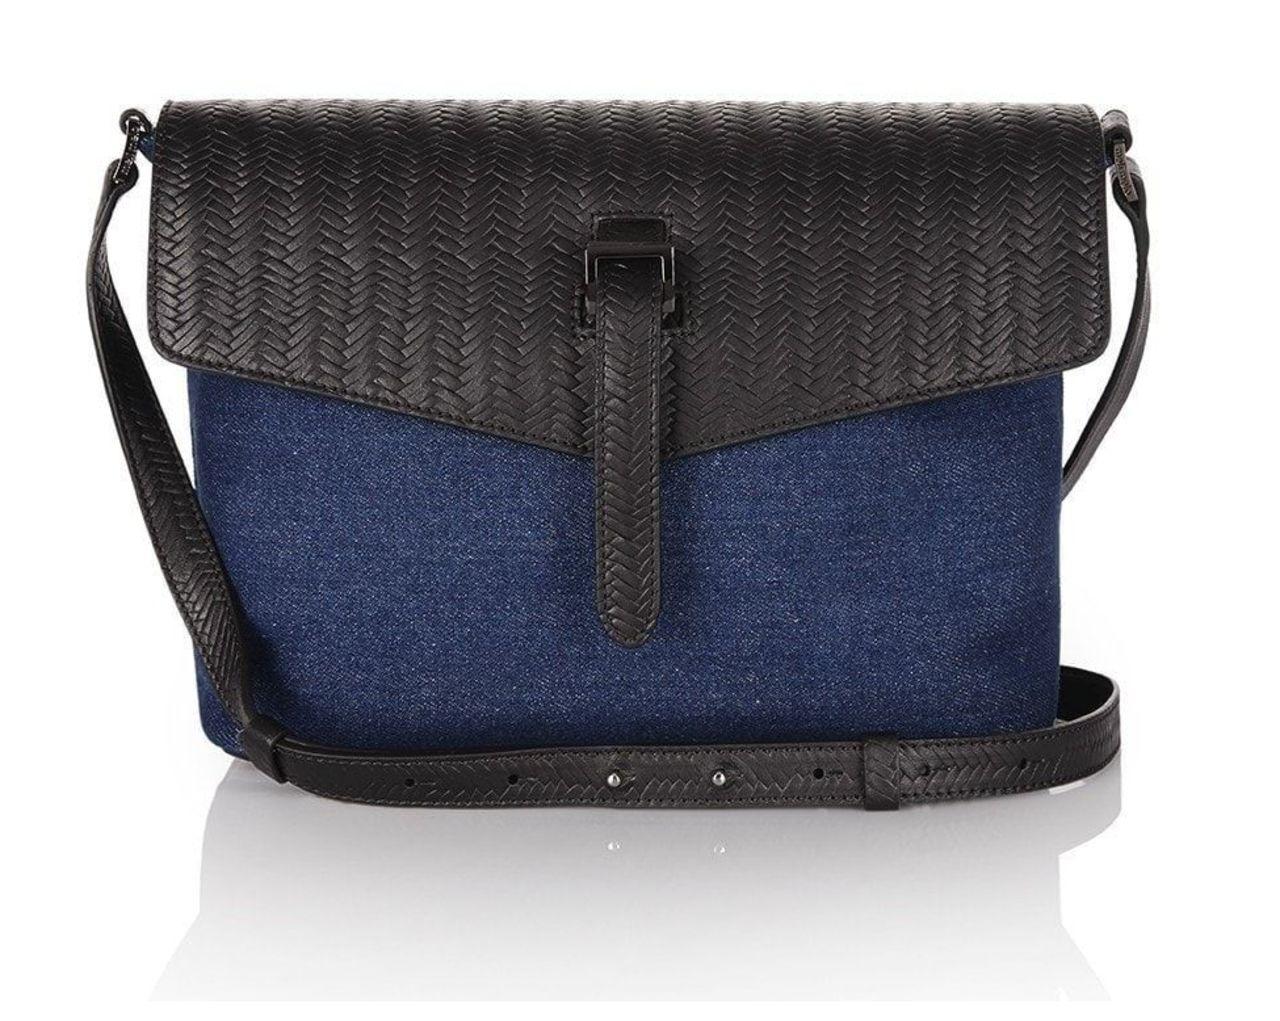 Maisie Medium Cross Body Bag Denim and Black Woven Leather